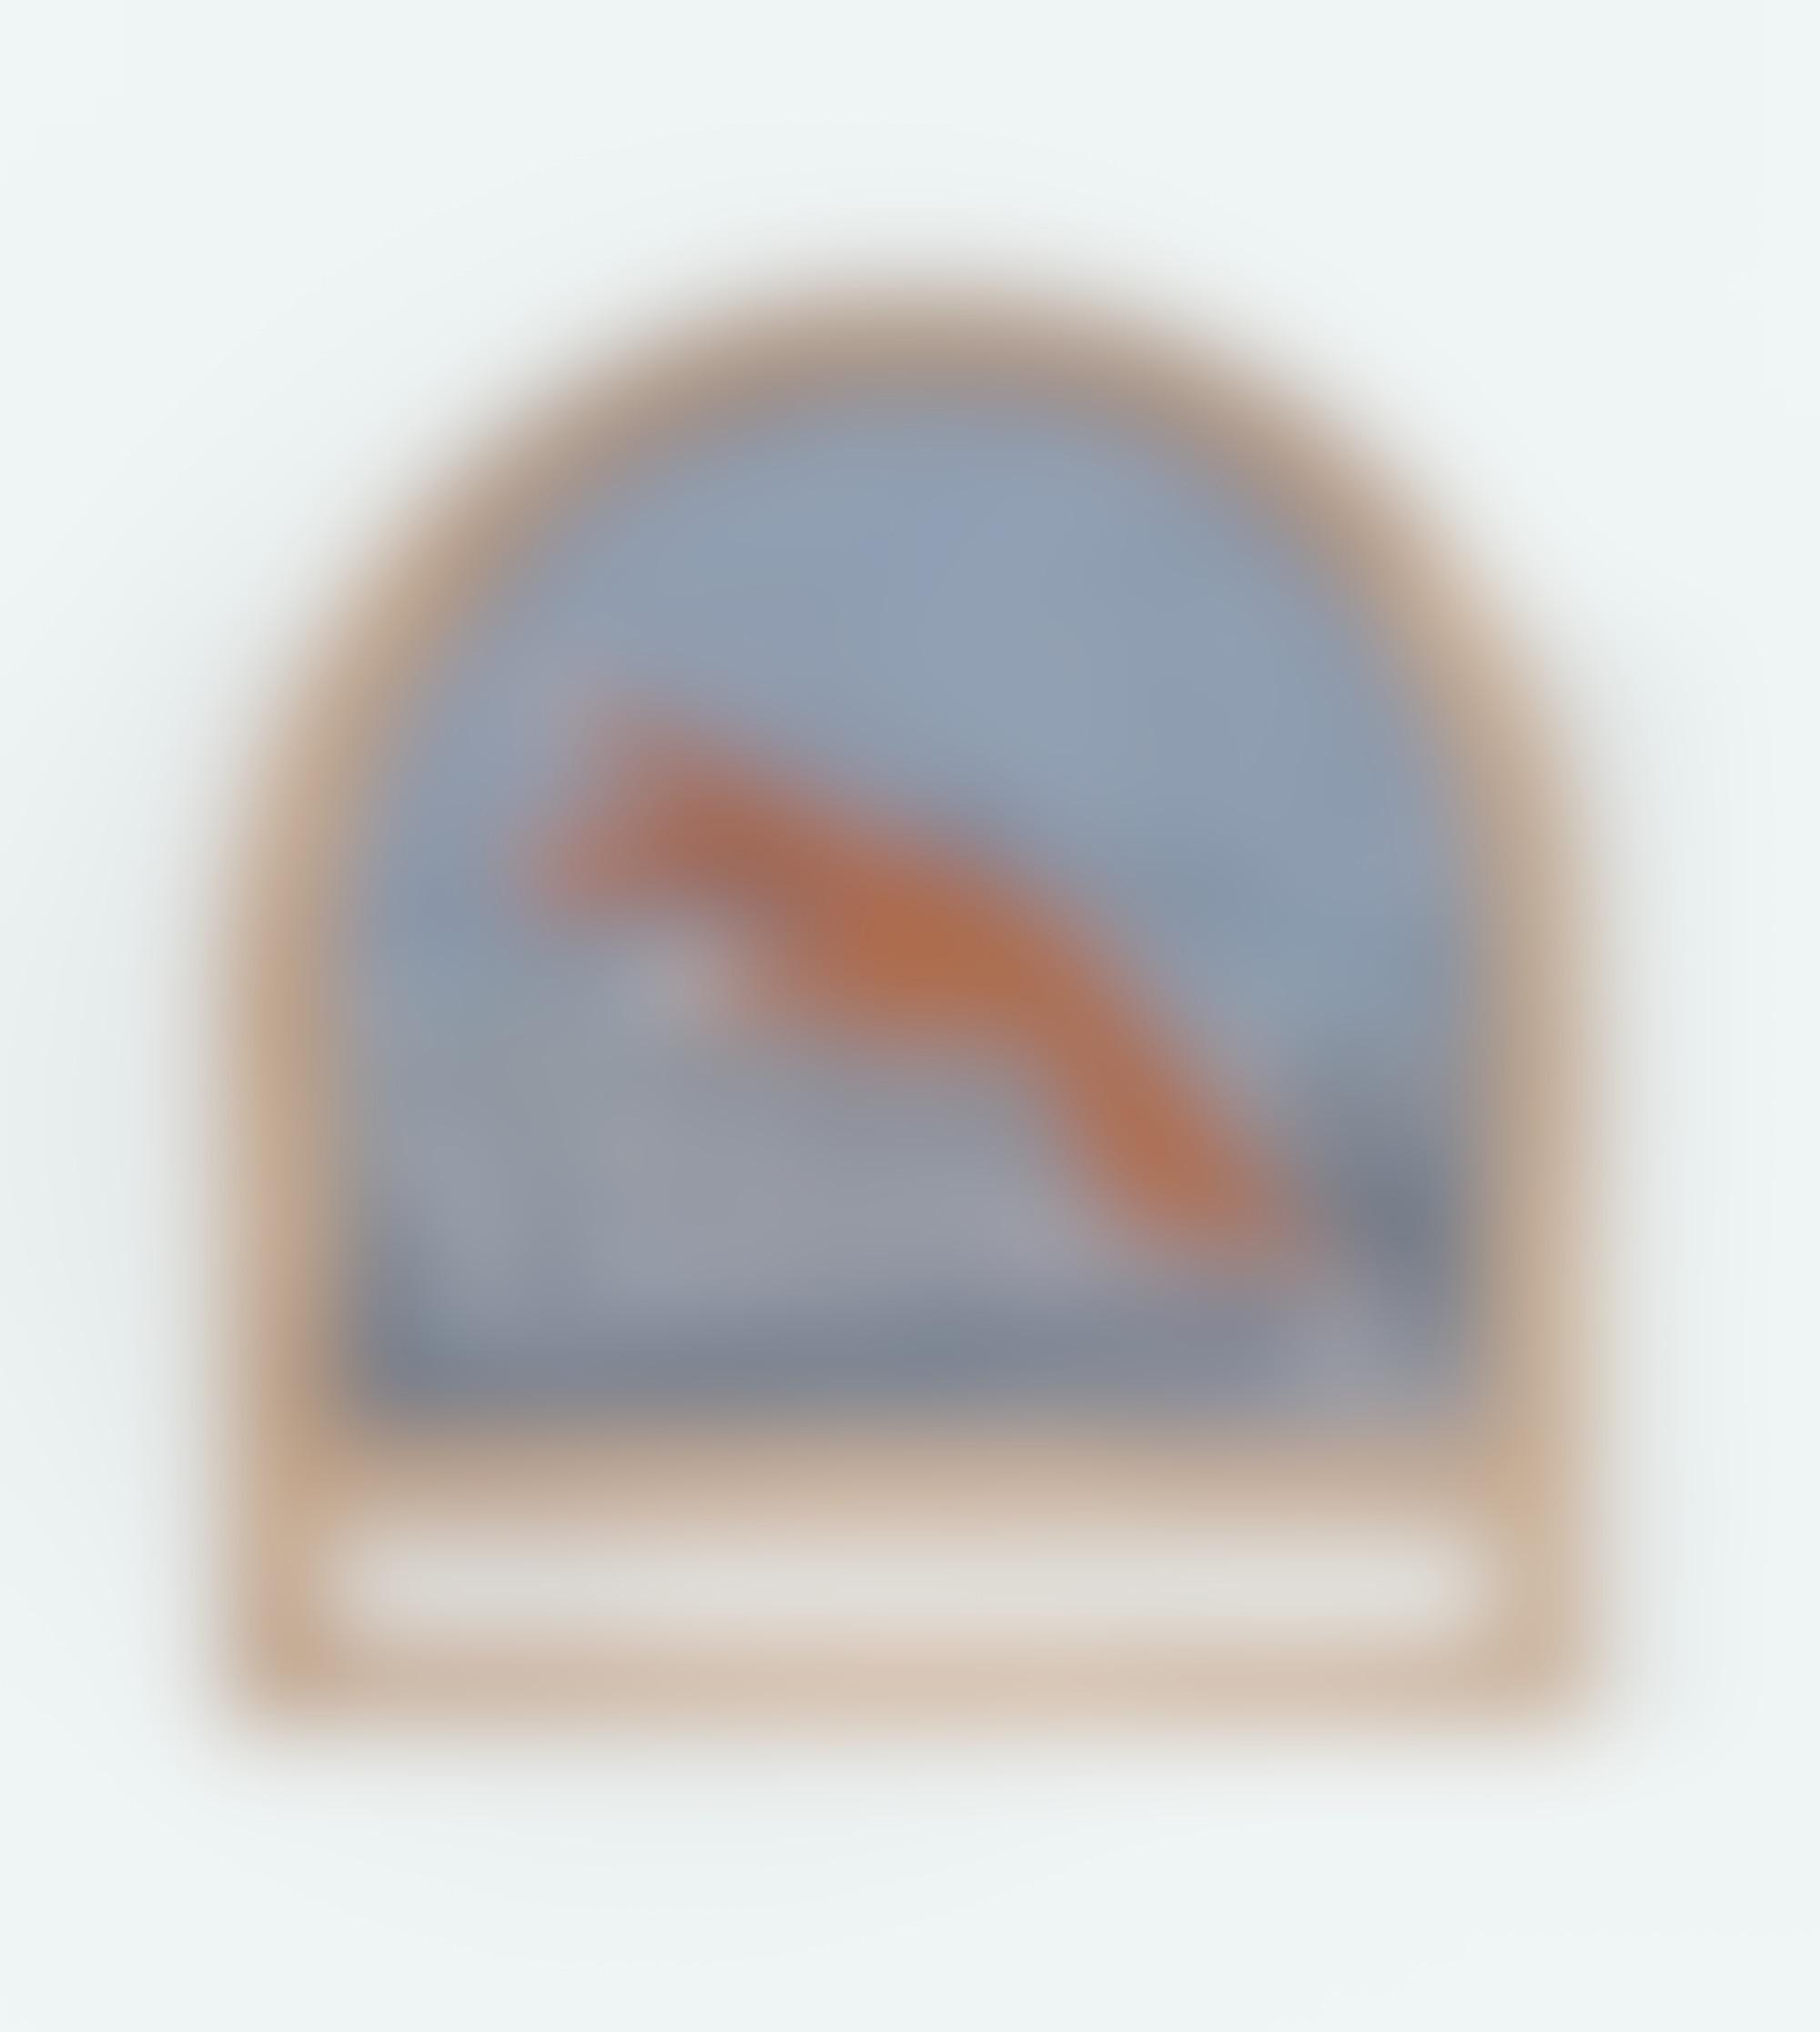 Fragment charlotte edey LR autocompressfitresizeixlibphp 1 1 0max h2000max w3 D2000q80sda121cdb990c46e6987b7d87e1a48d7d